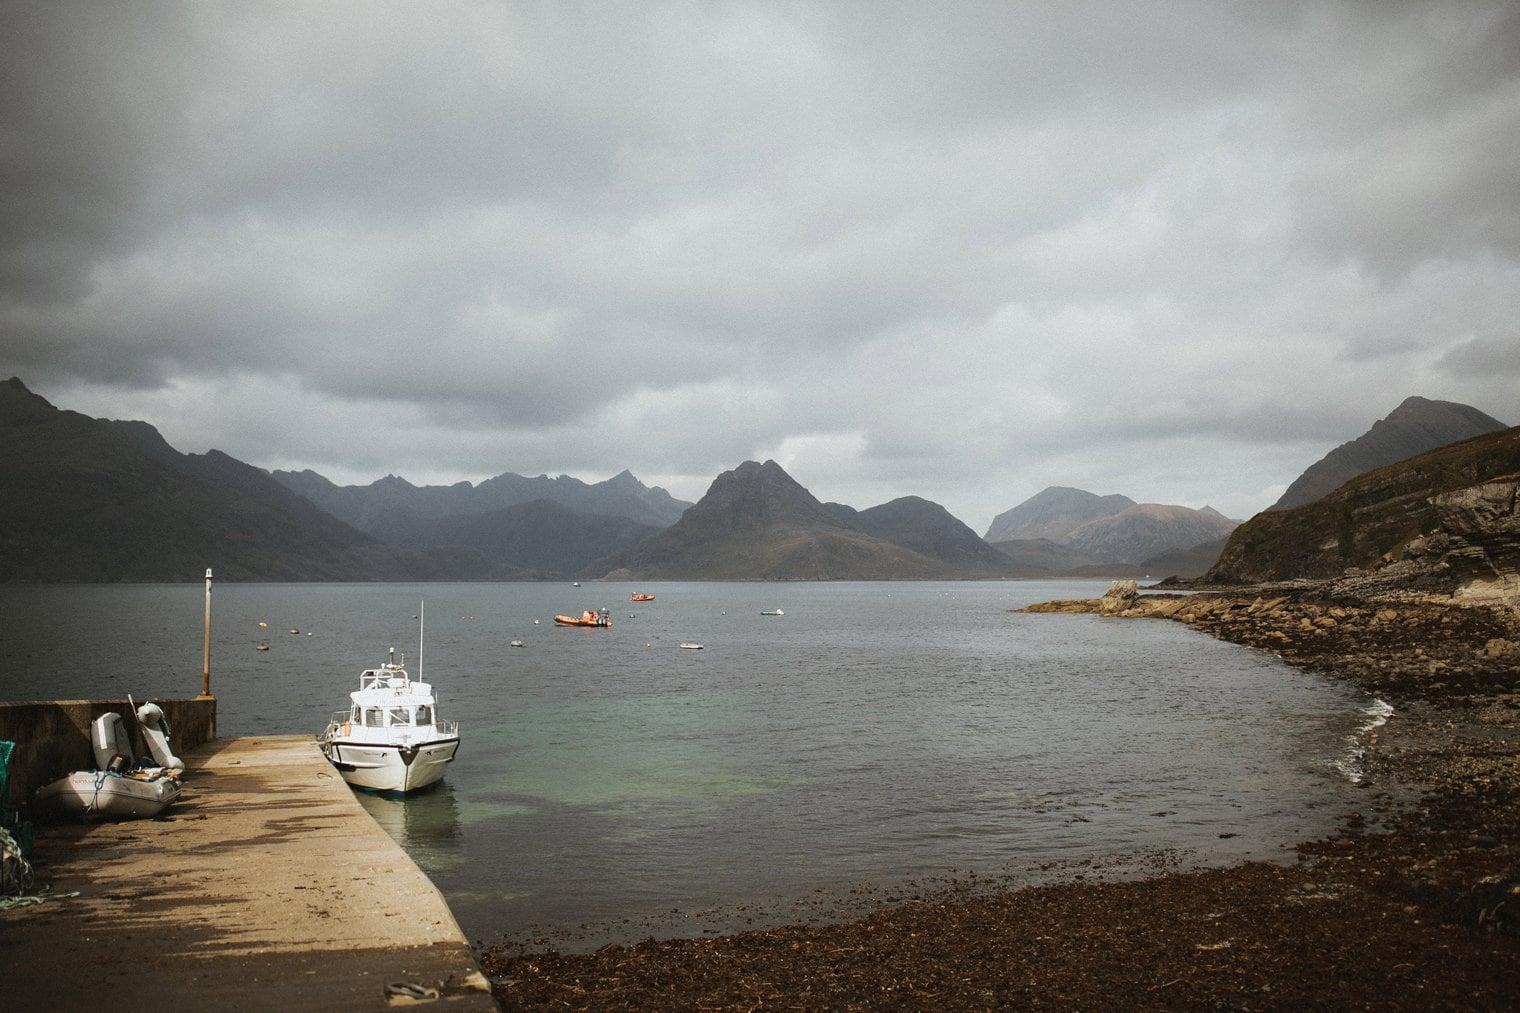 Loch Coruisk Boat Tour for wedding